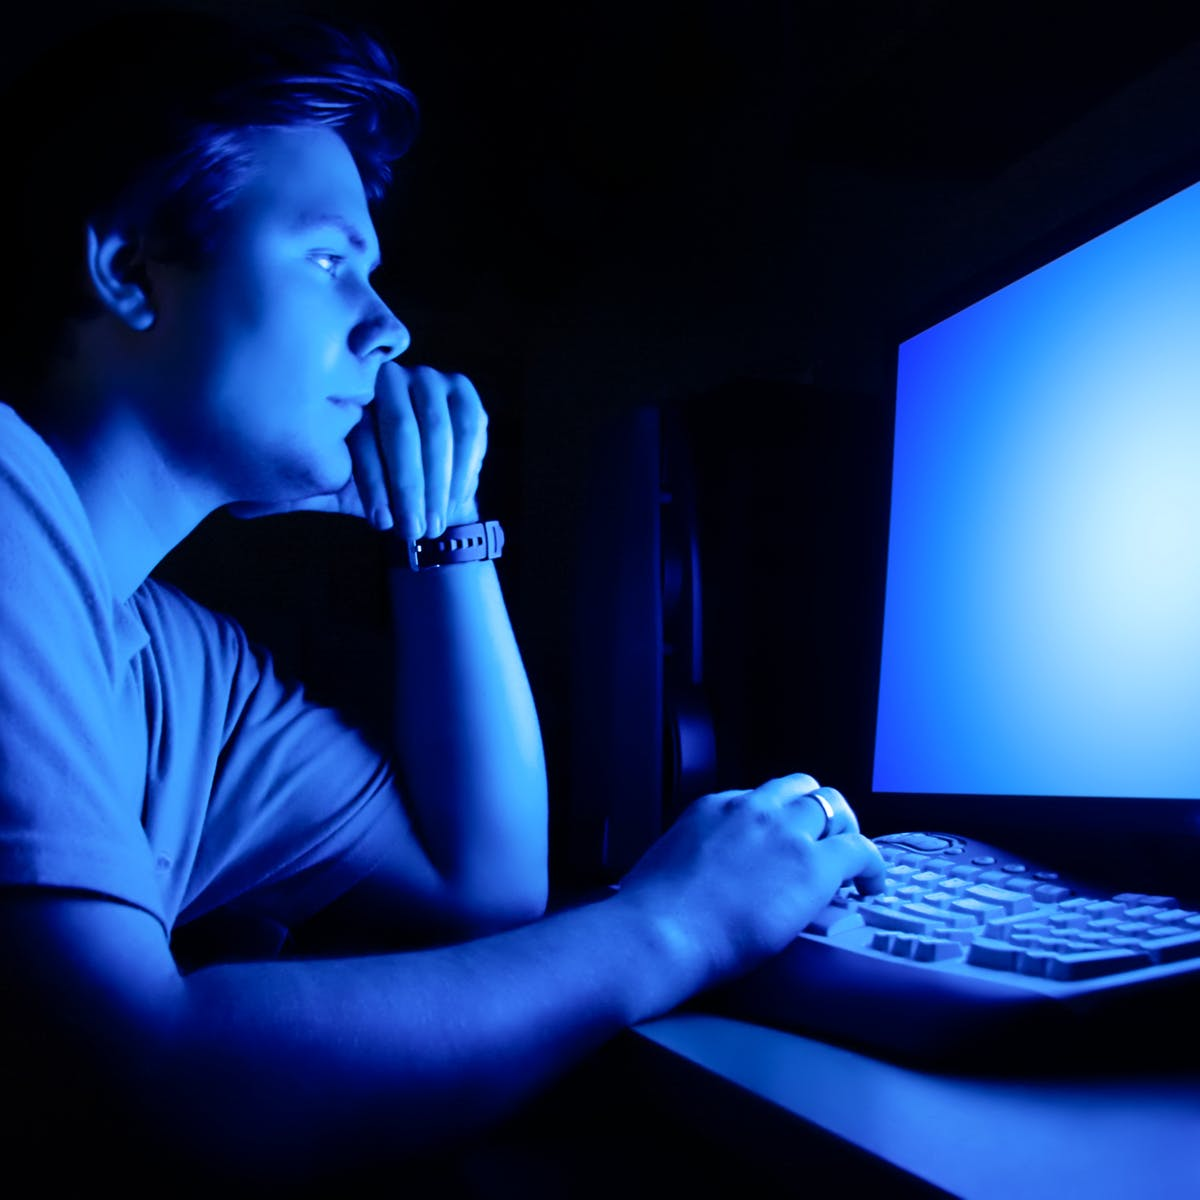 Blue light isn't the main source of eye fatigue and sleep loss ...